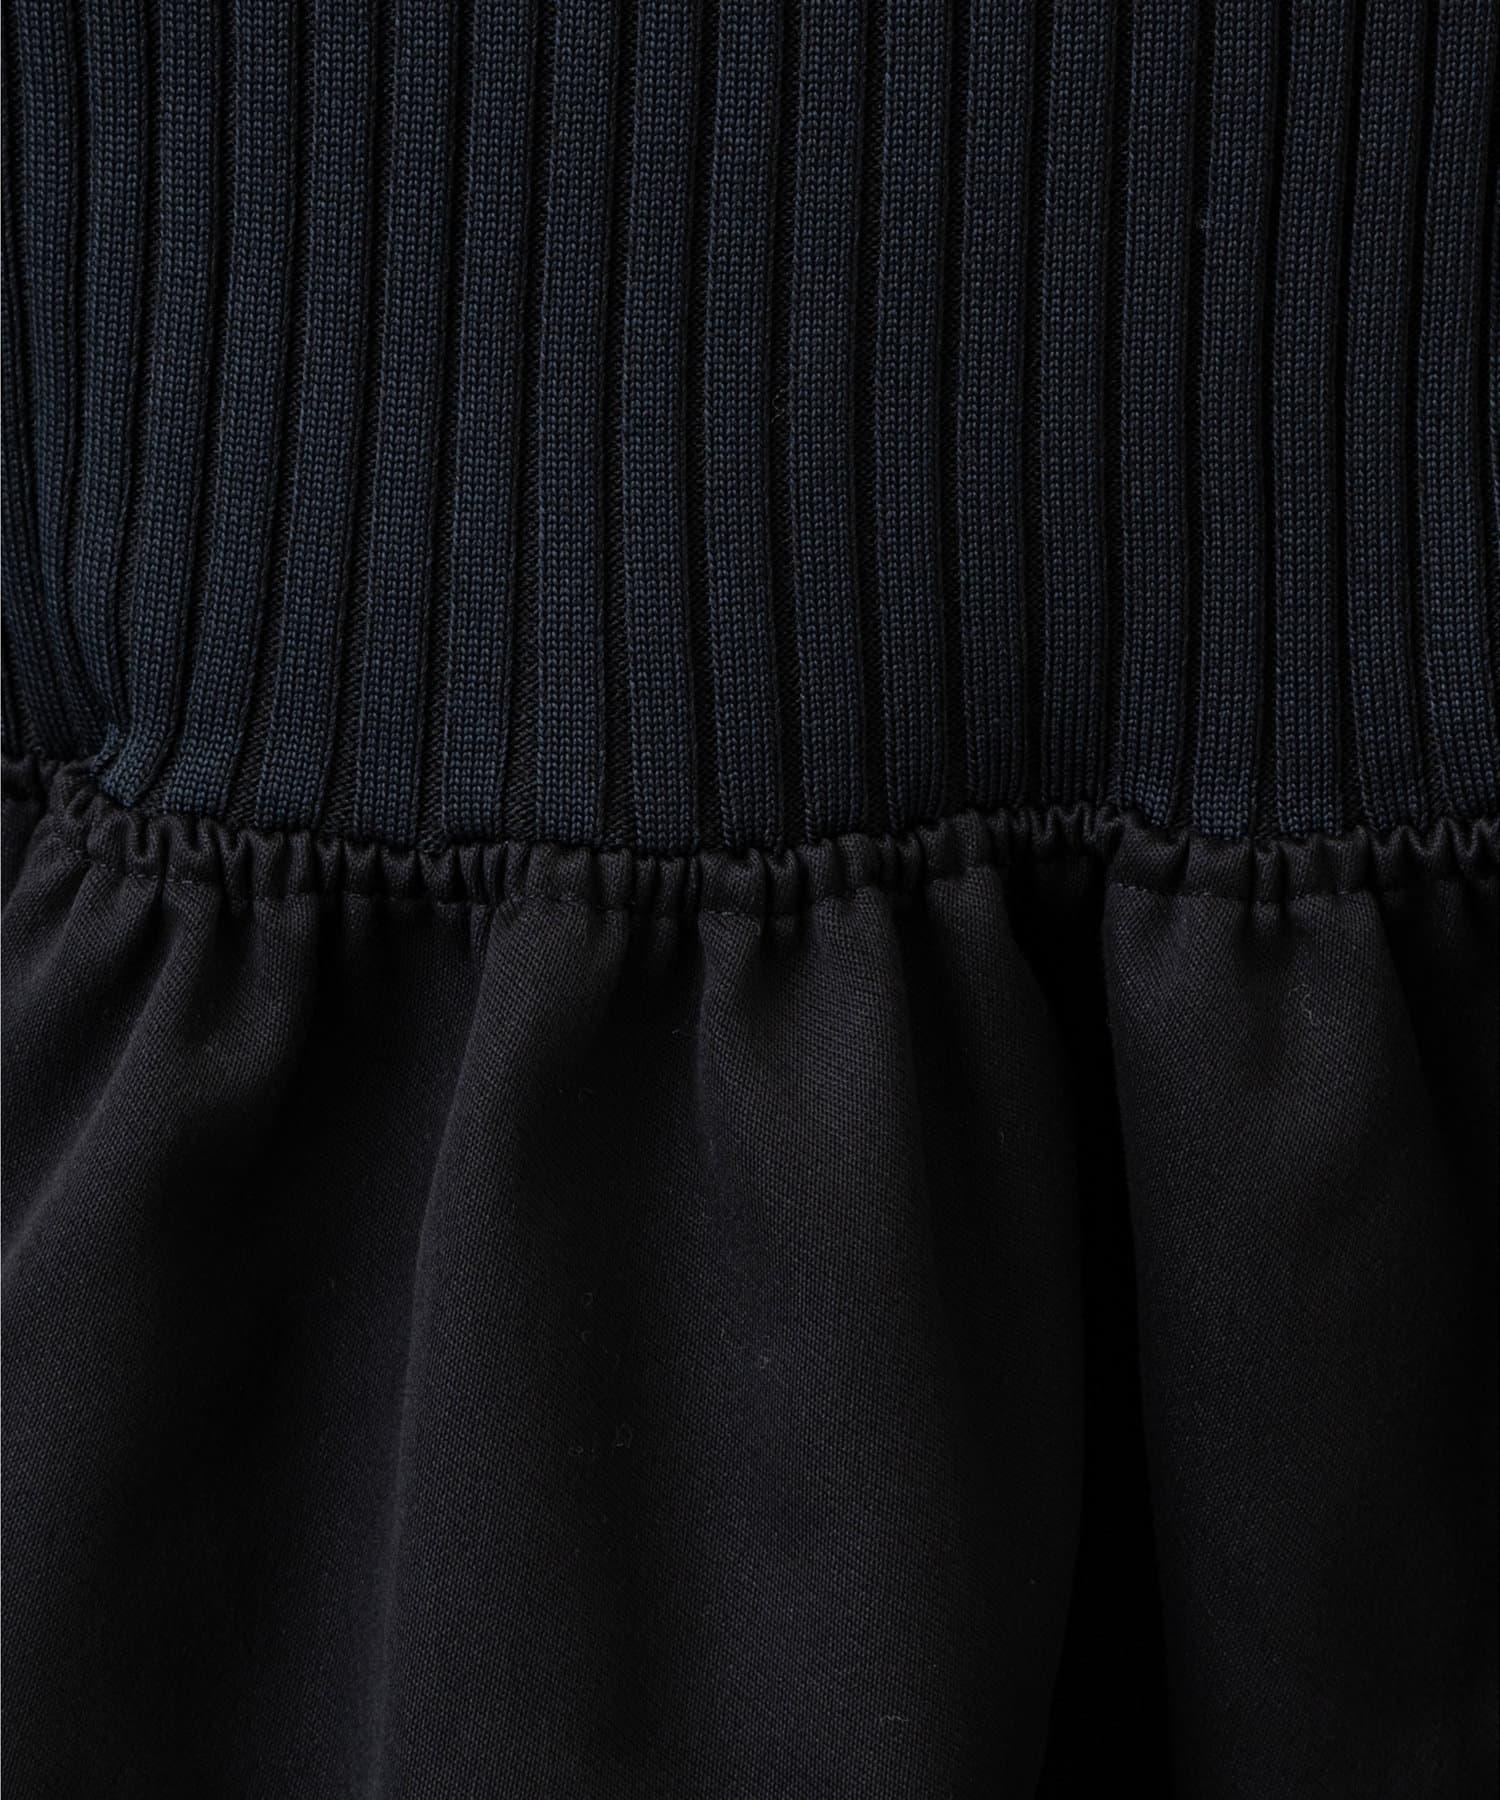 GALLARDAGALANTE(ガリャルダガランテ) 【CEPIE.】リブニットヘムフレアスカート